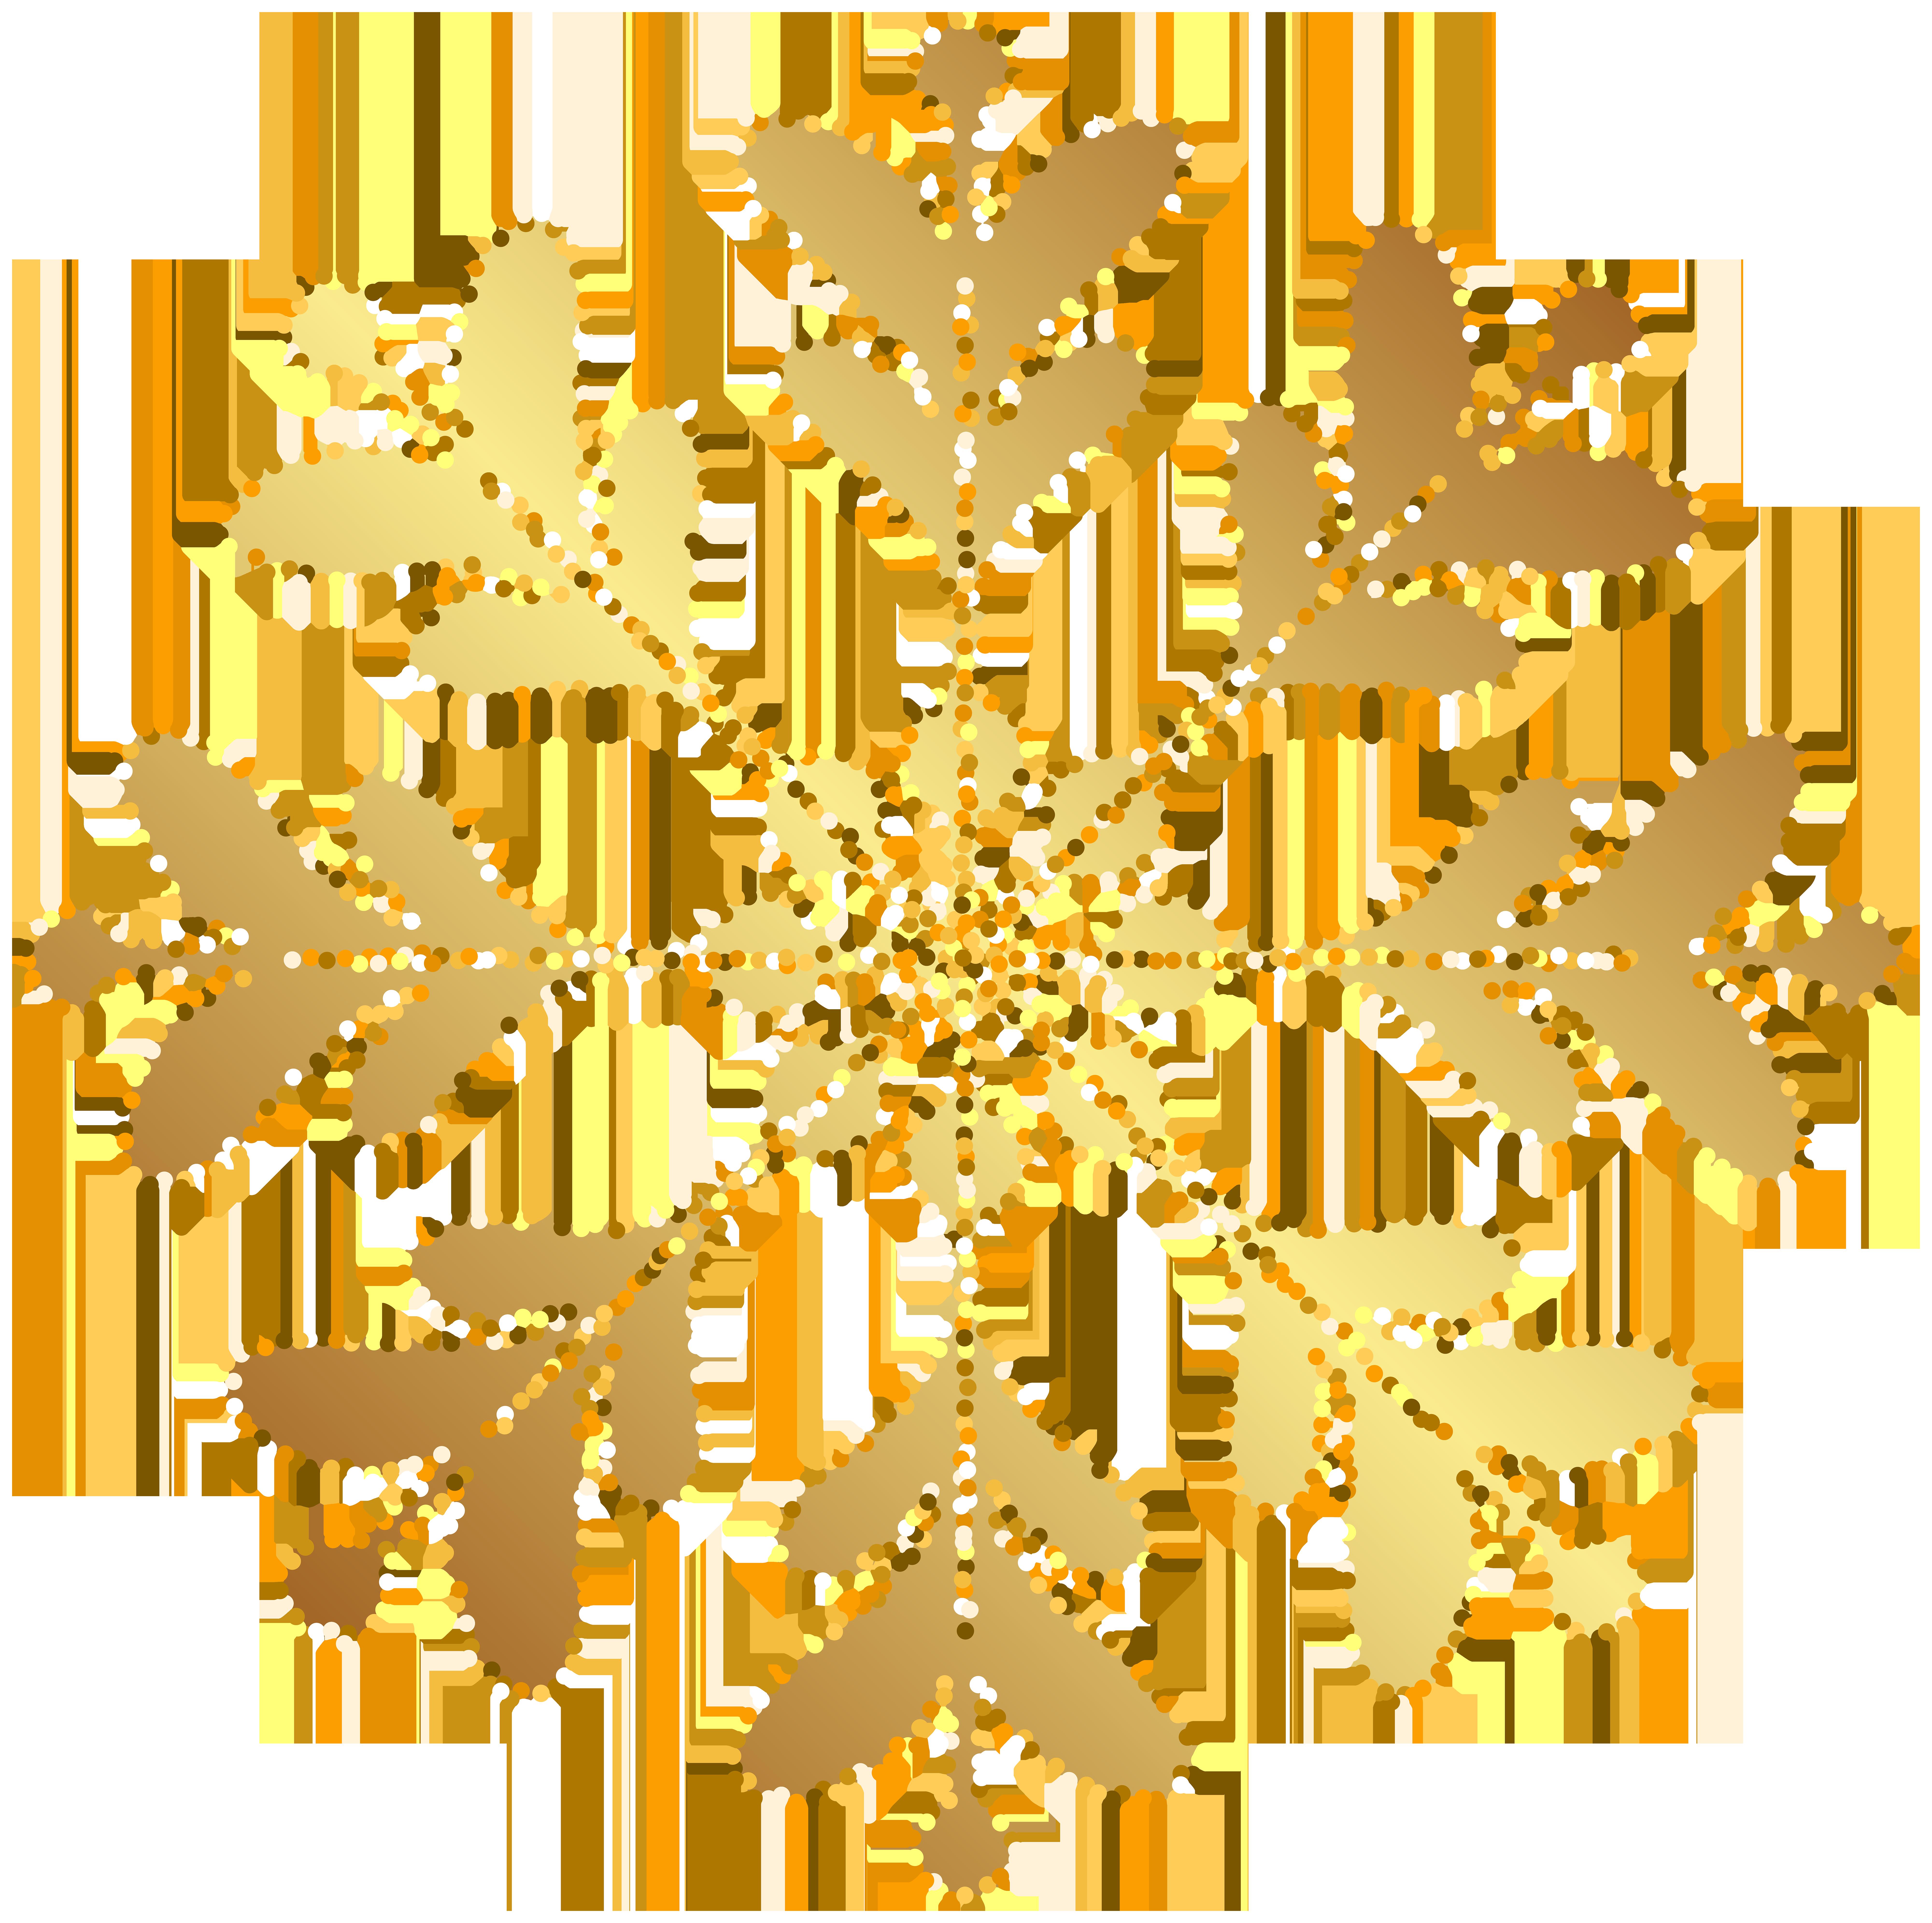 Snowflake clipart yellow. Gold transparent clip art